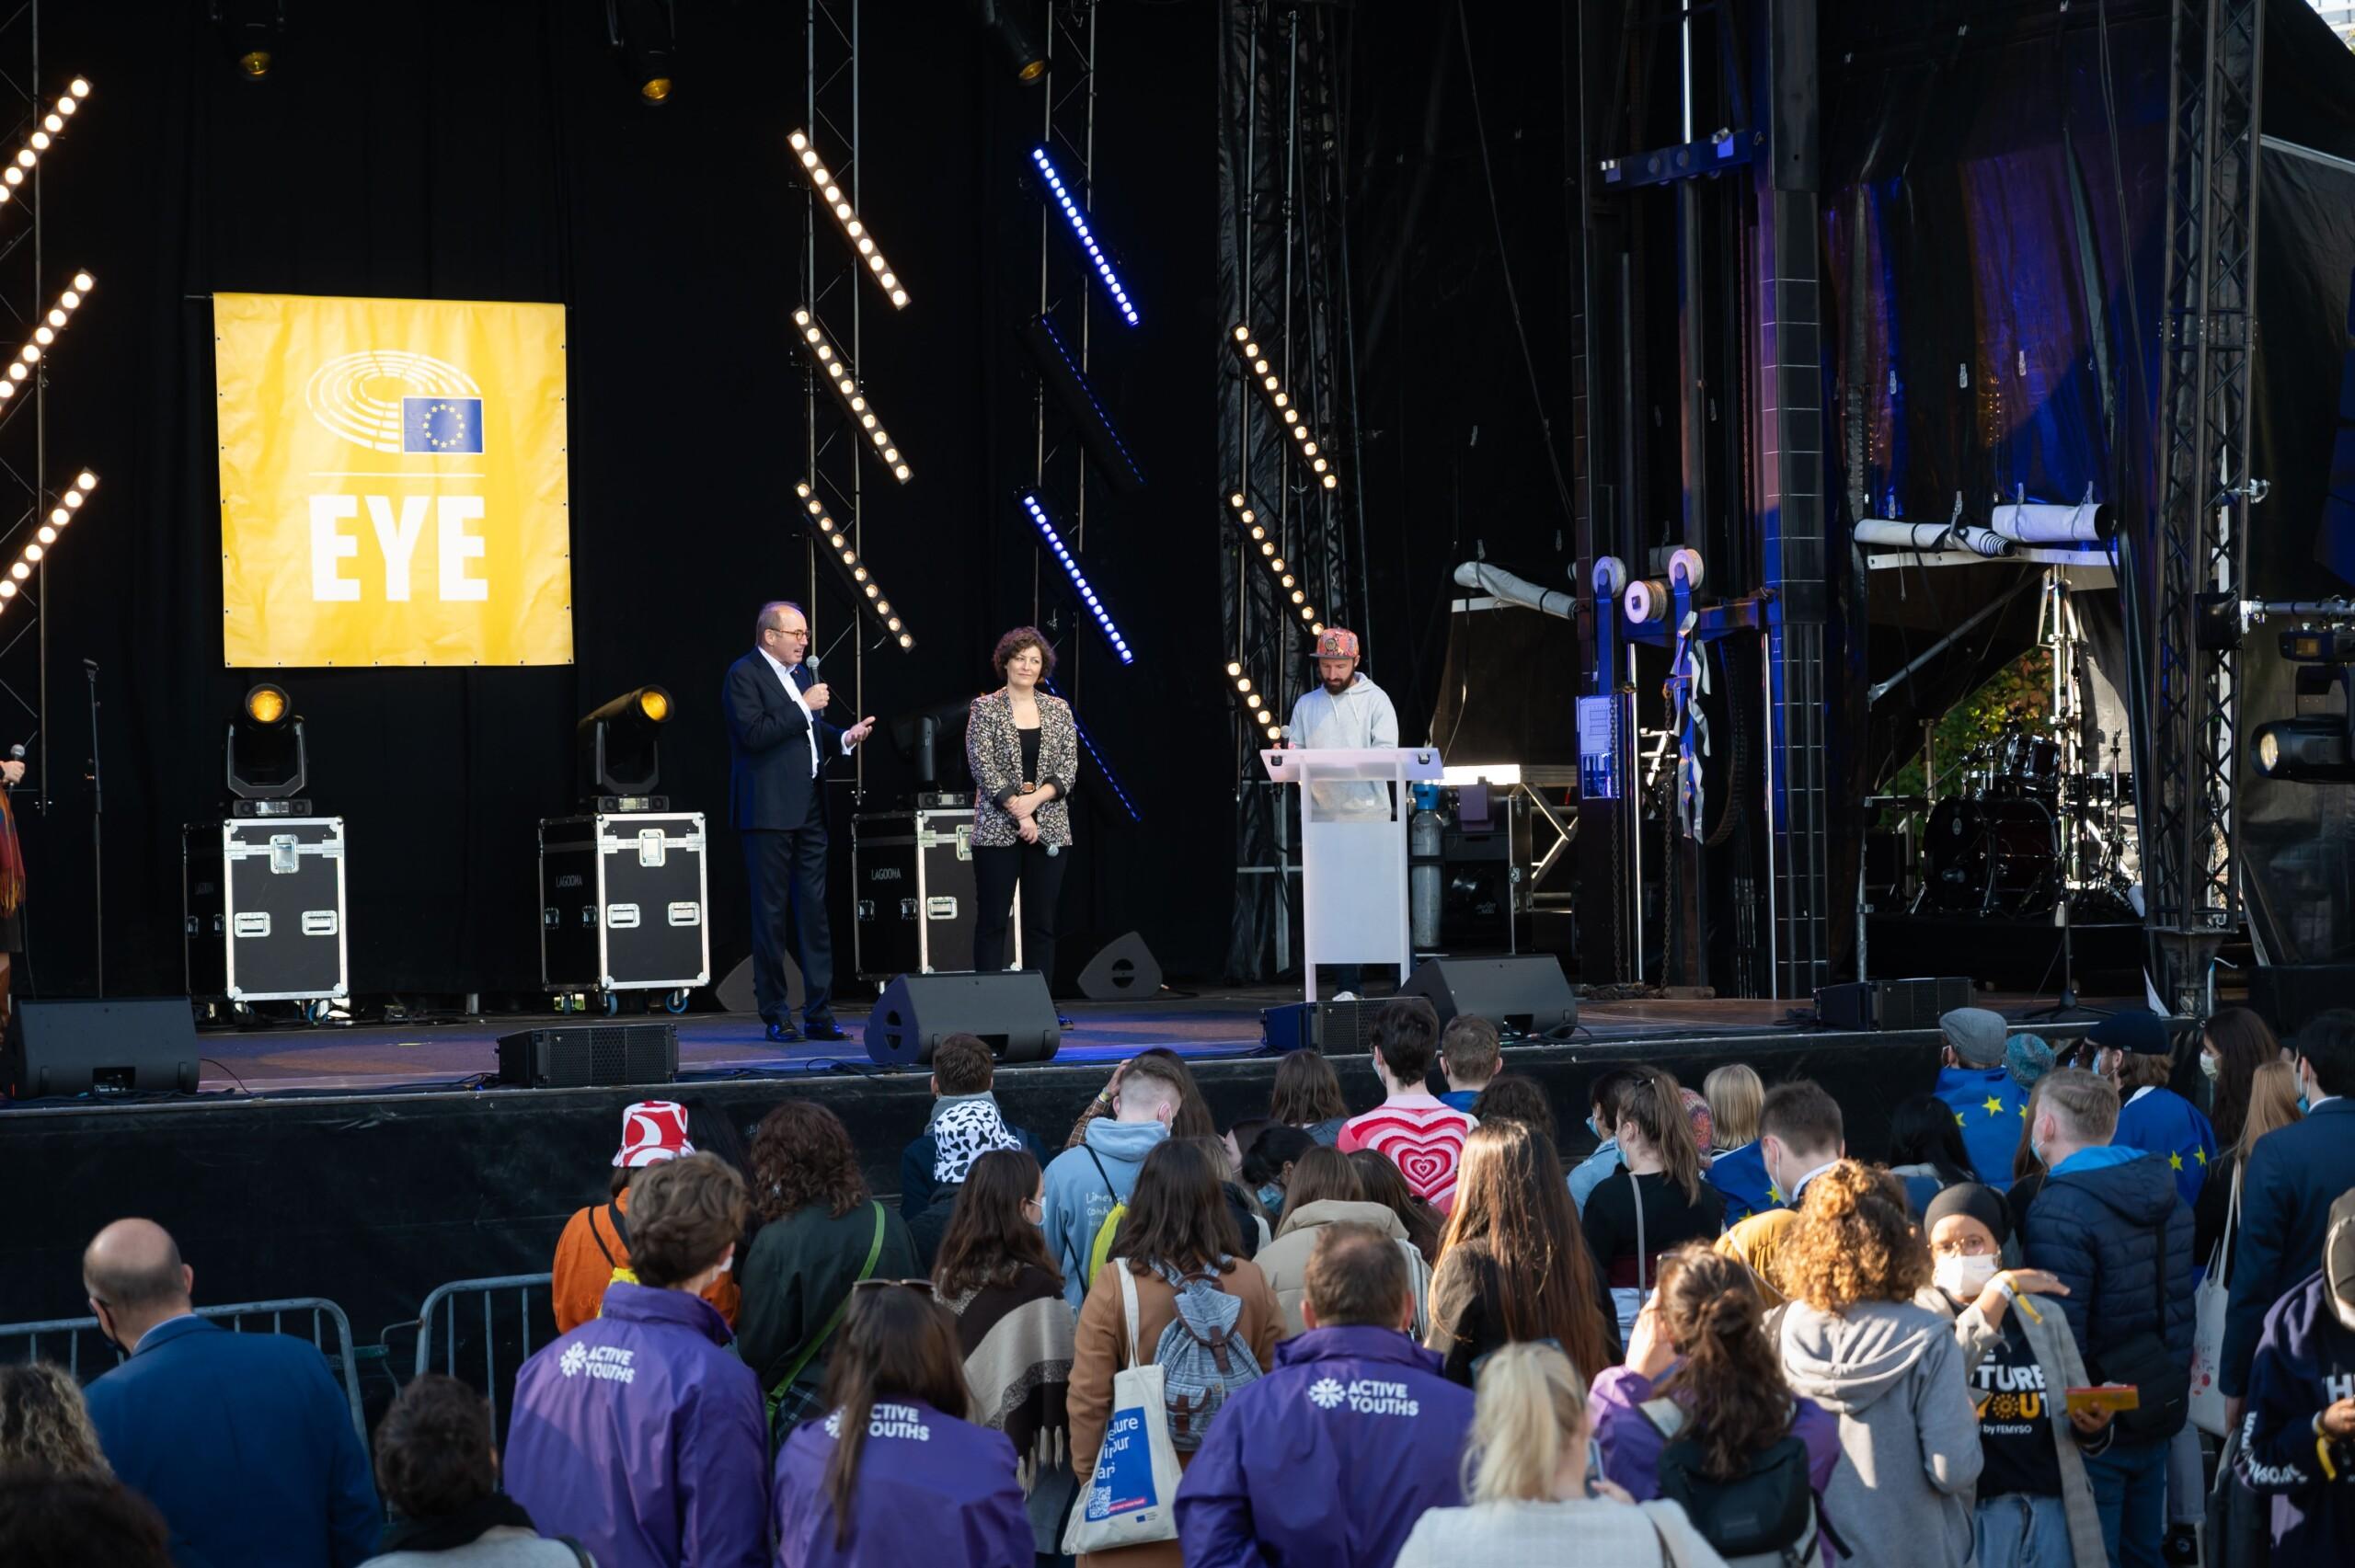 European Youth Event (EYE 2021) - EYE Village